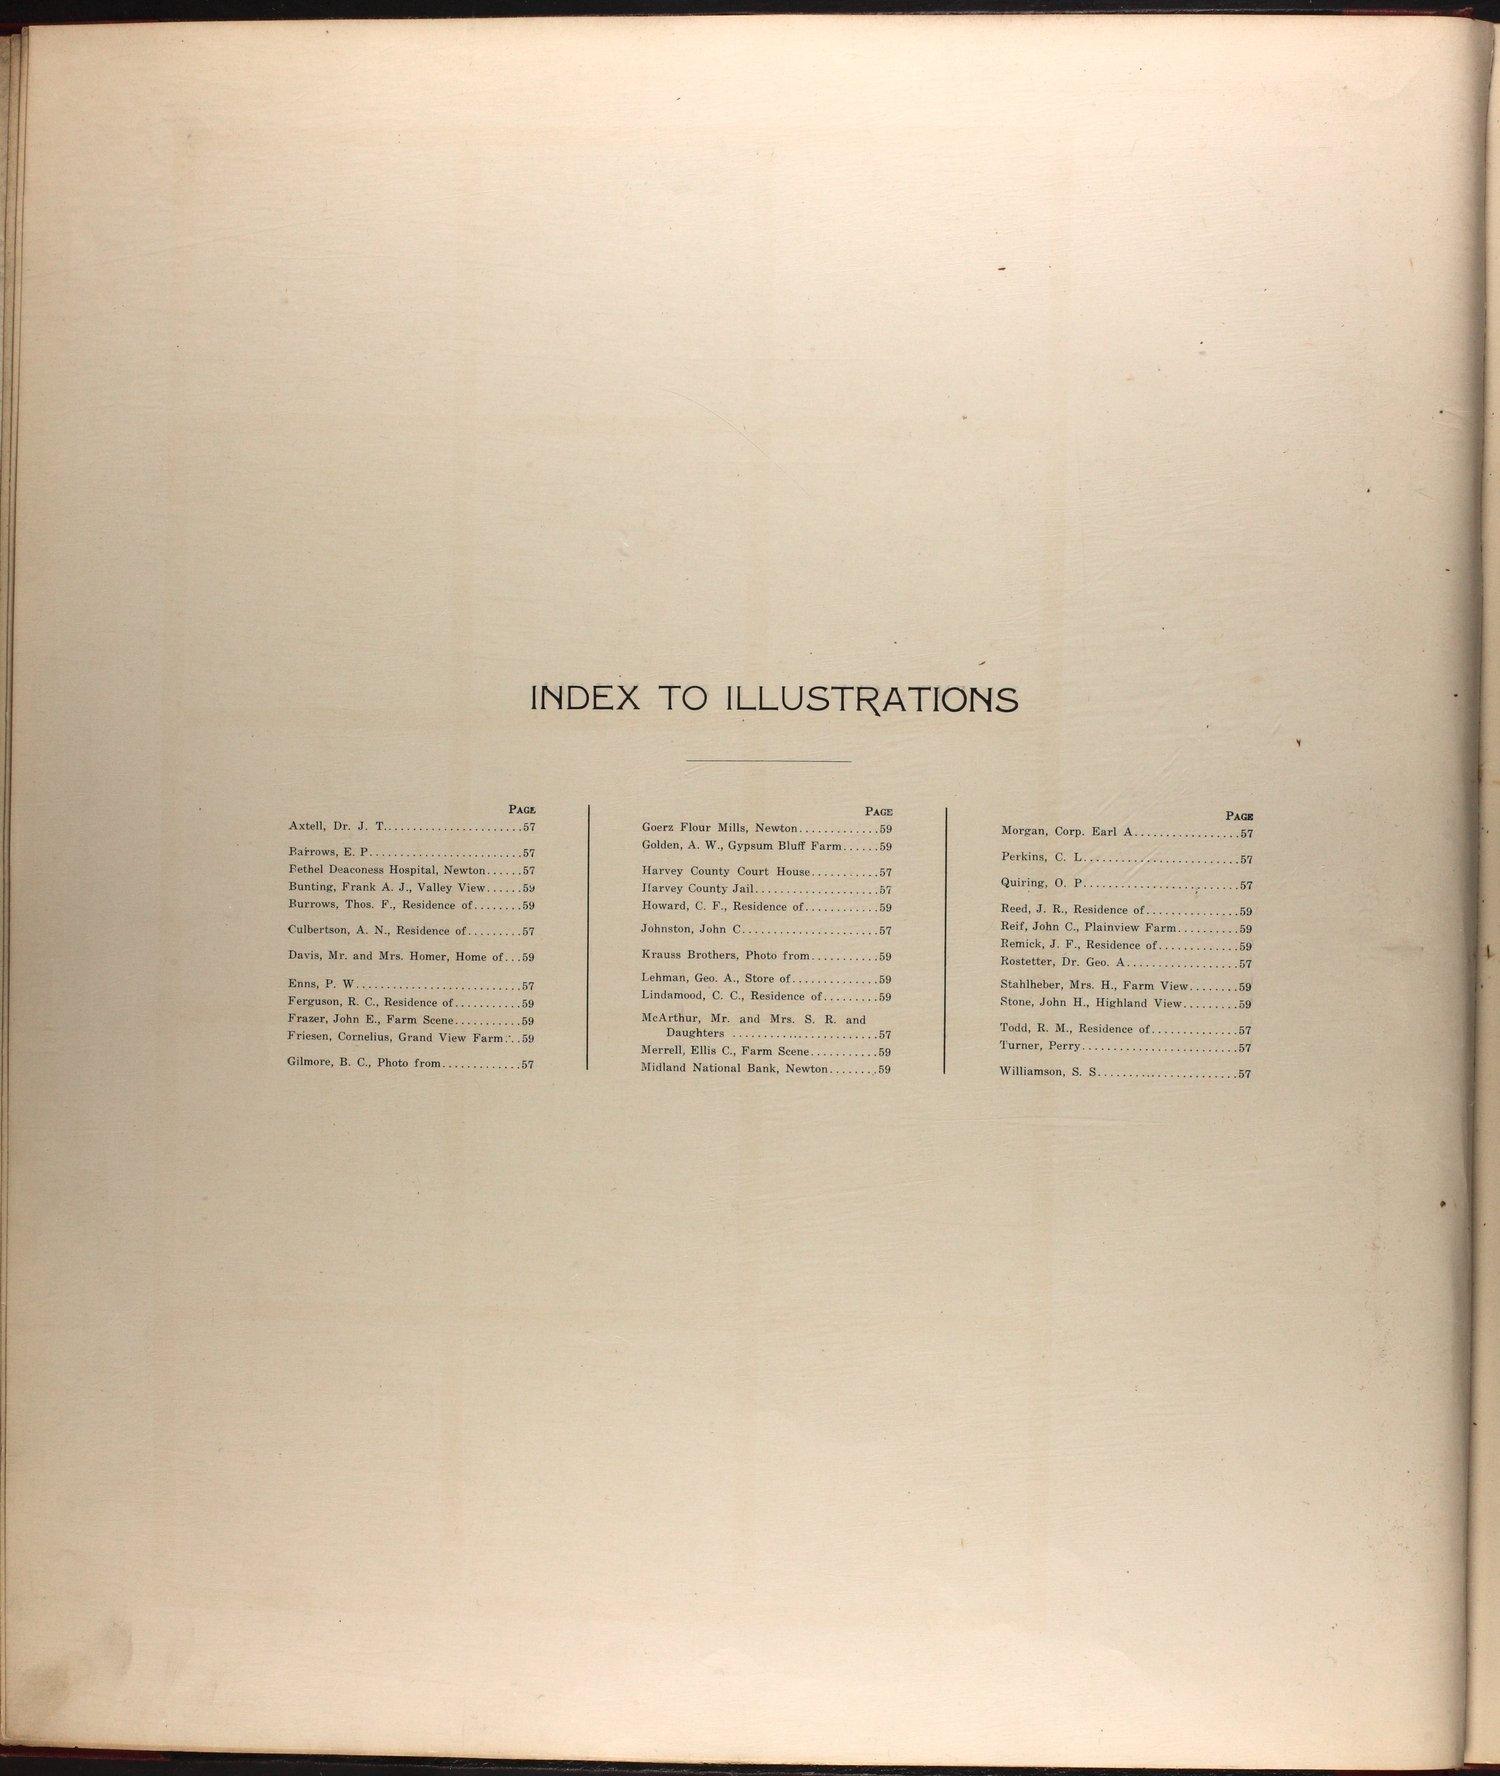 Standard atlas of Harvey County, Kansas - Index to Illustrations